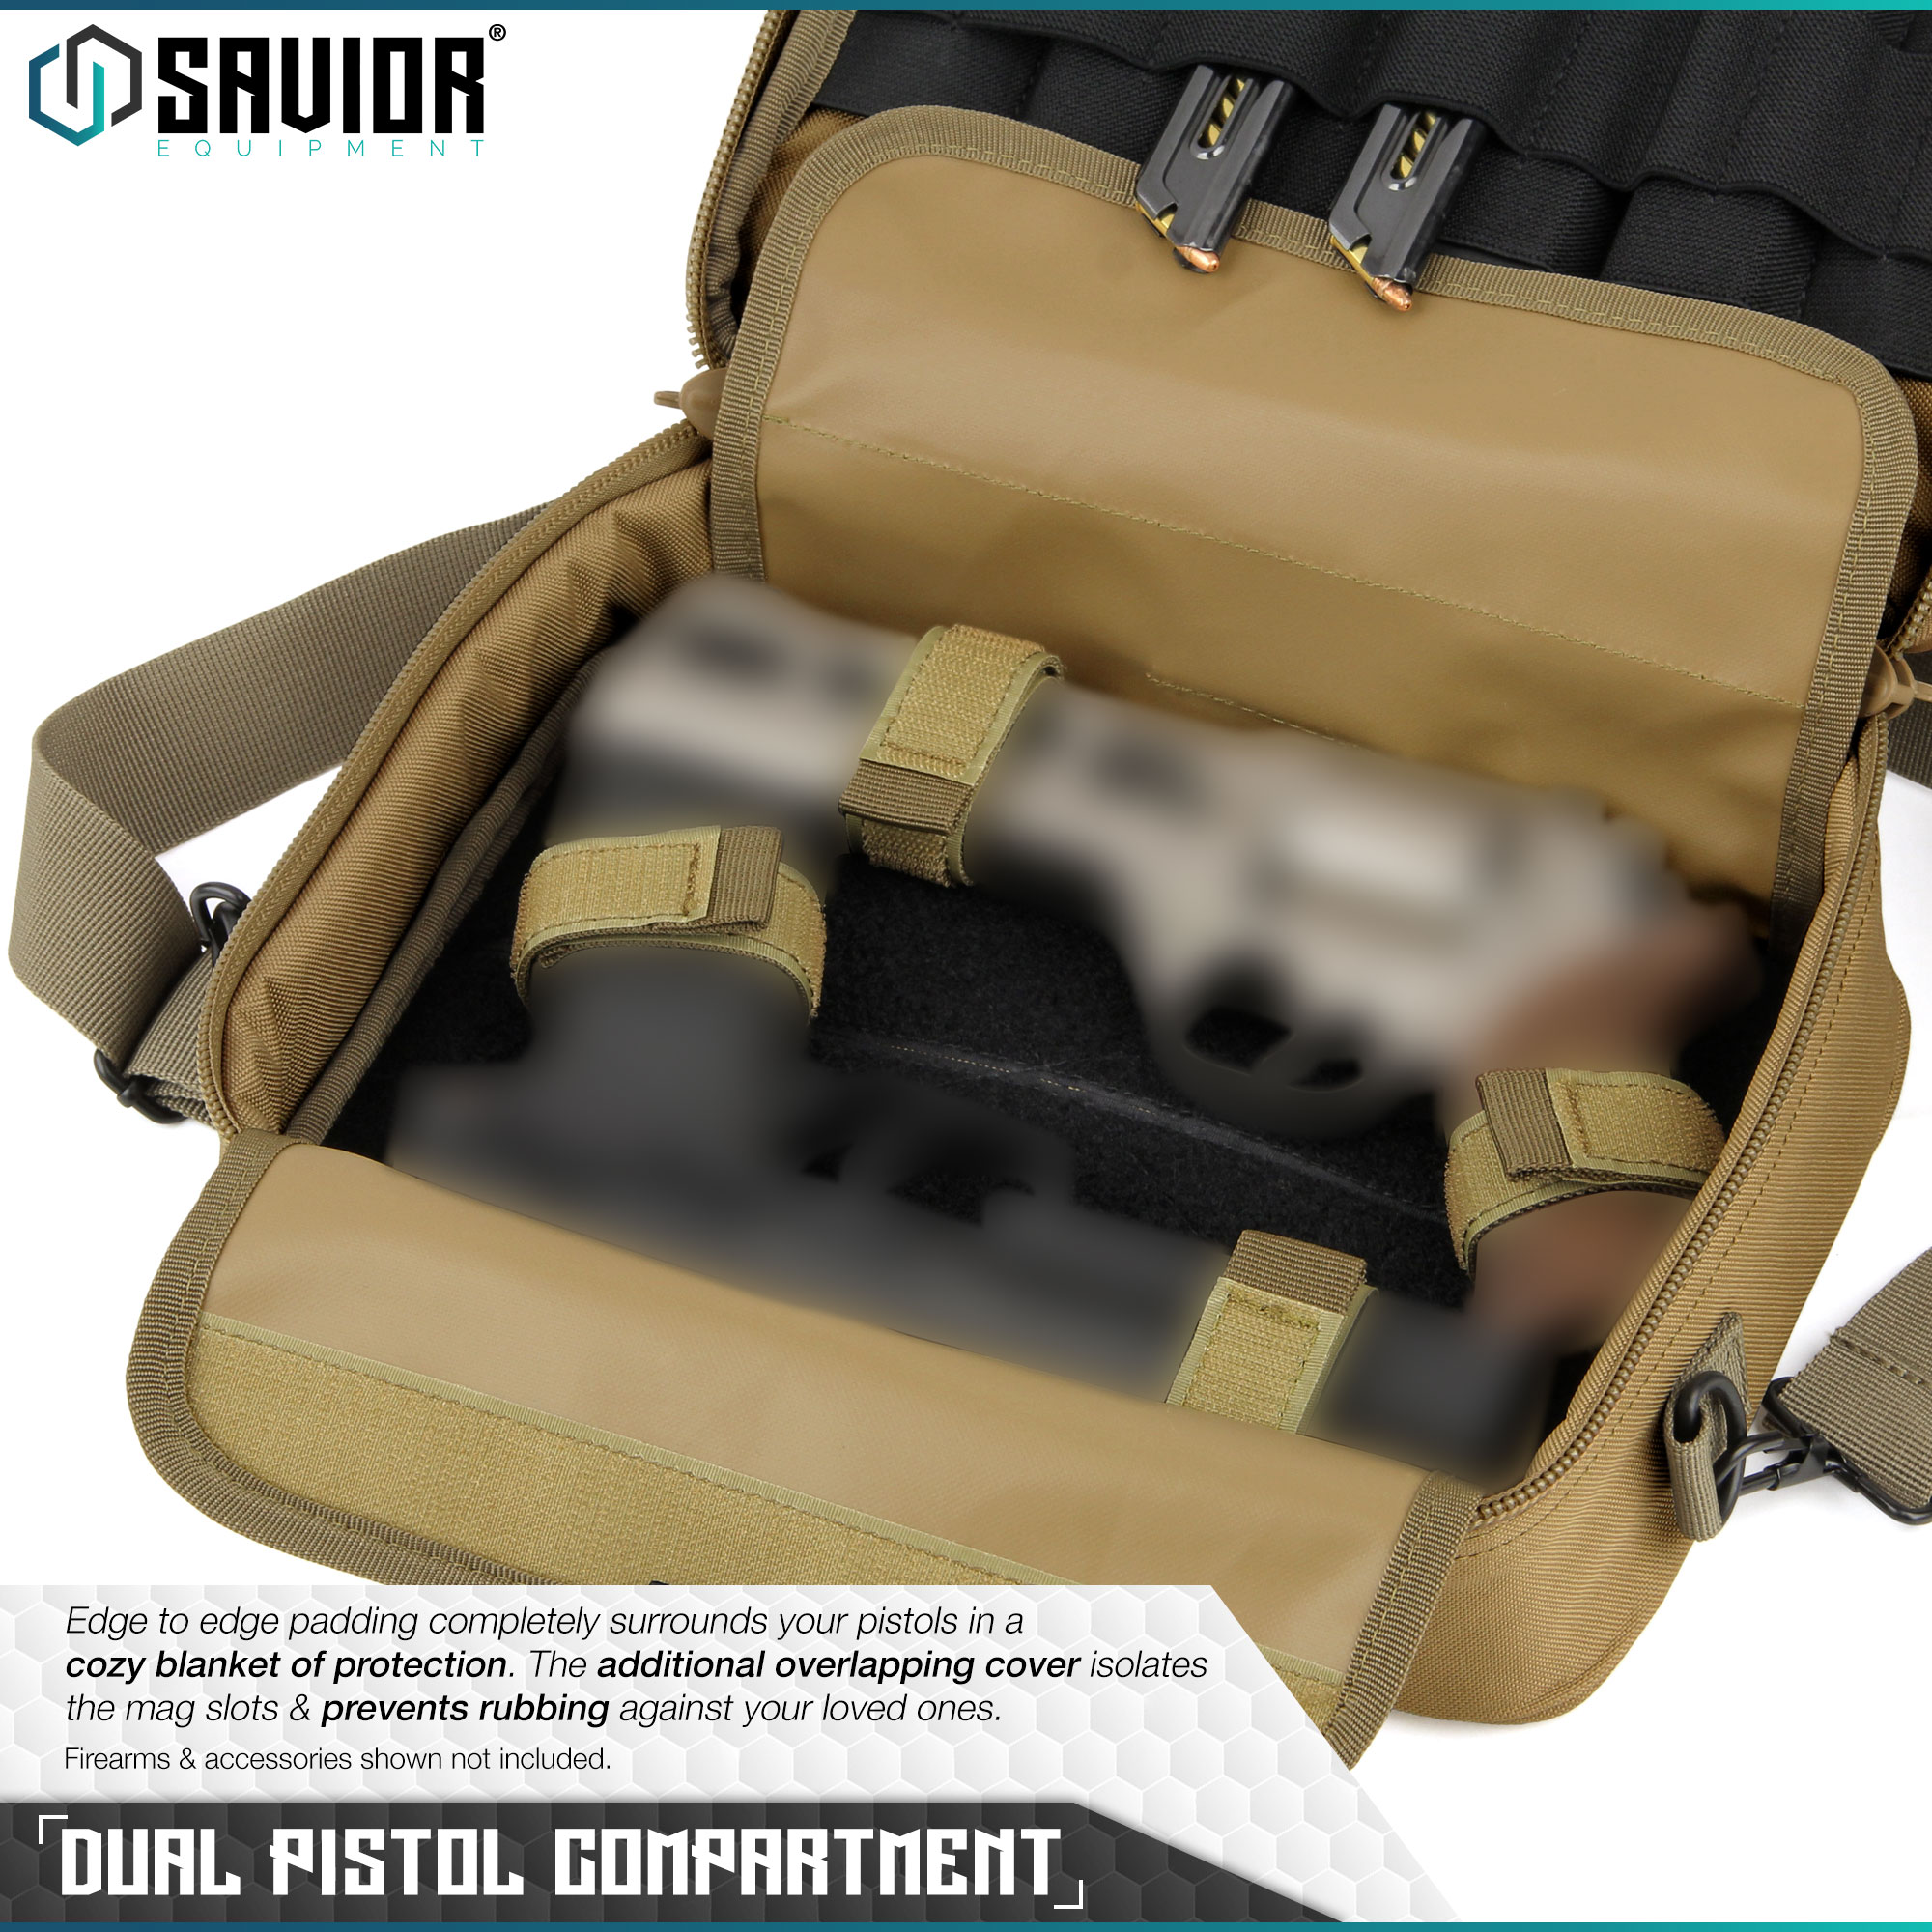 thumbnail 9 - 034-SAVIOR-034-Padded-Discreet-Double-Handgun-Bag-Pistol-Storage-Case-w-Mag-Pouch-Slot